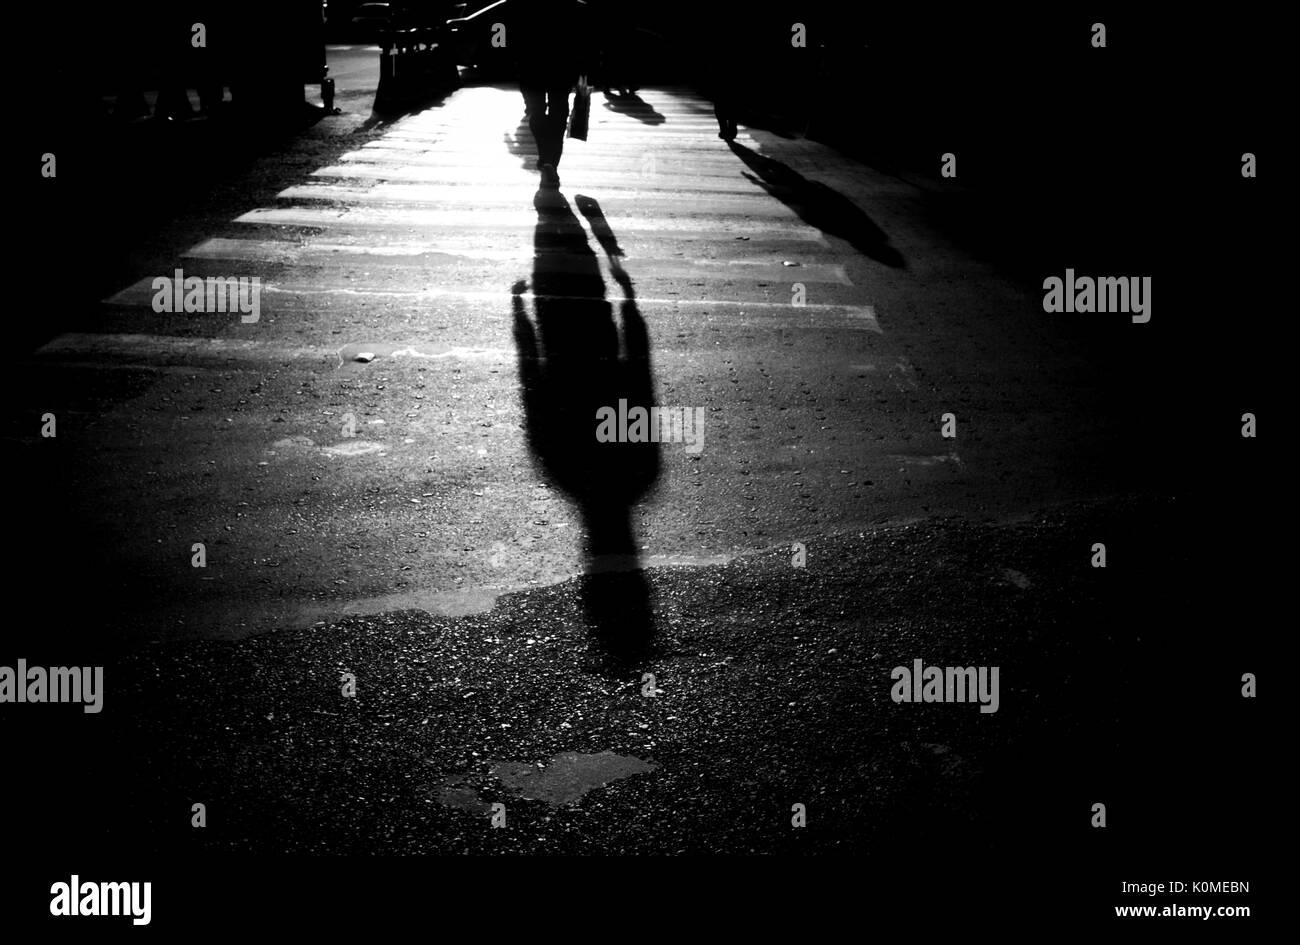 Homme ombre sur ton road, Kolkata, Bengale occidental, Inde, Asie Banque D'Images